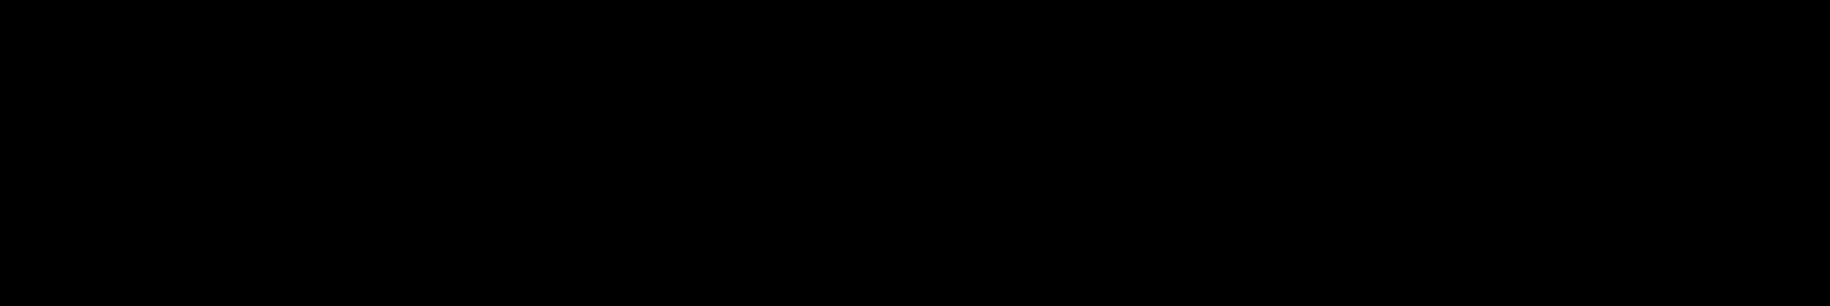 Leadspark-logo-musta